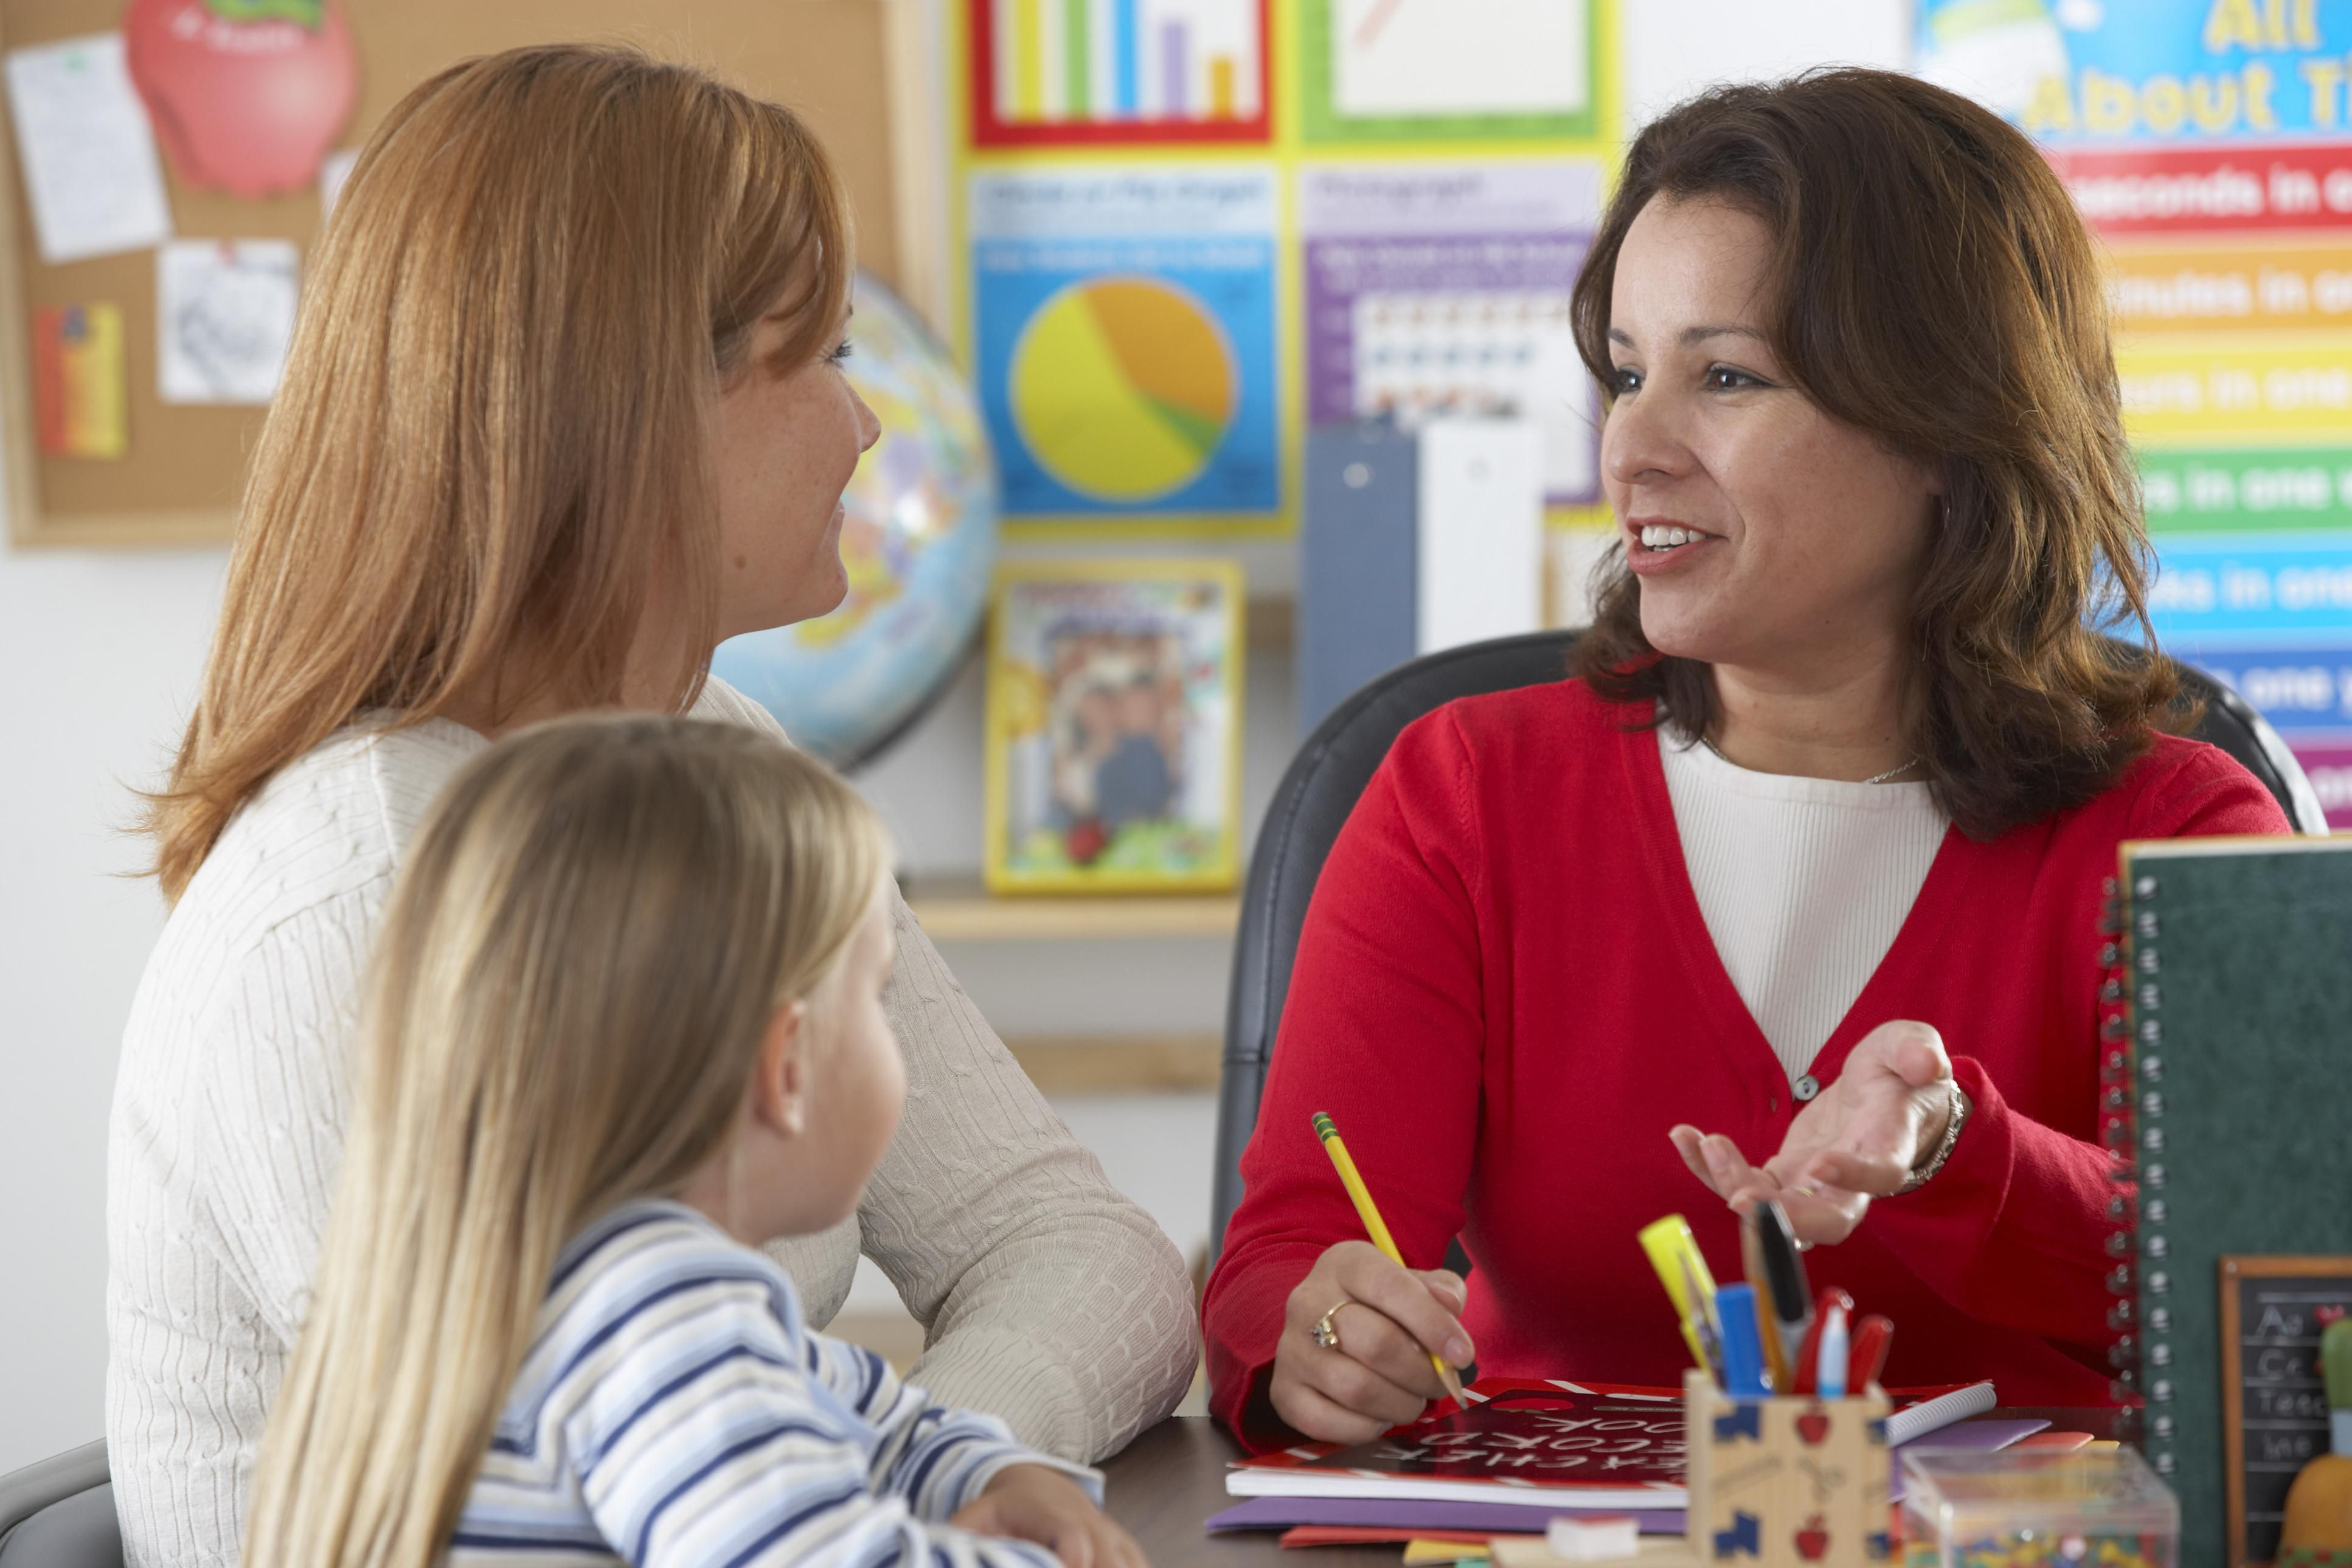 Questions to Ask During a Preschool Teacher Interview